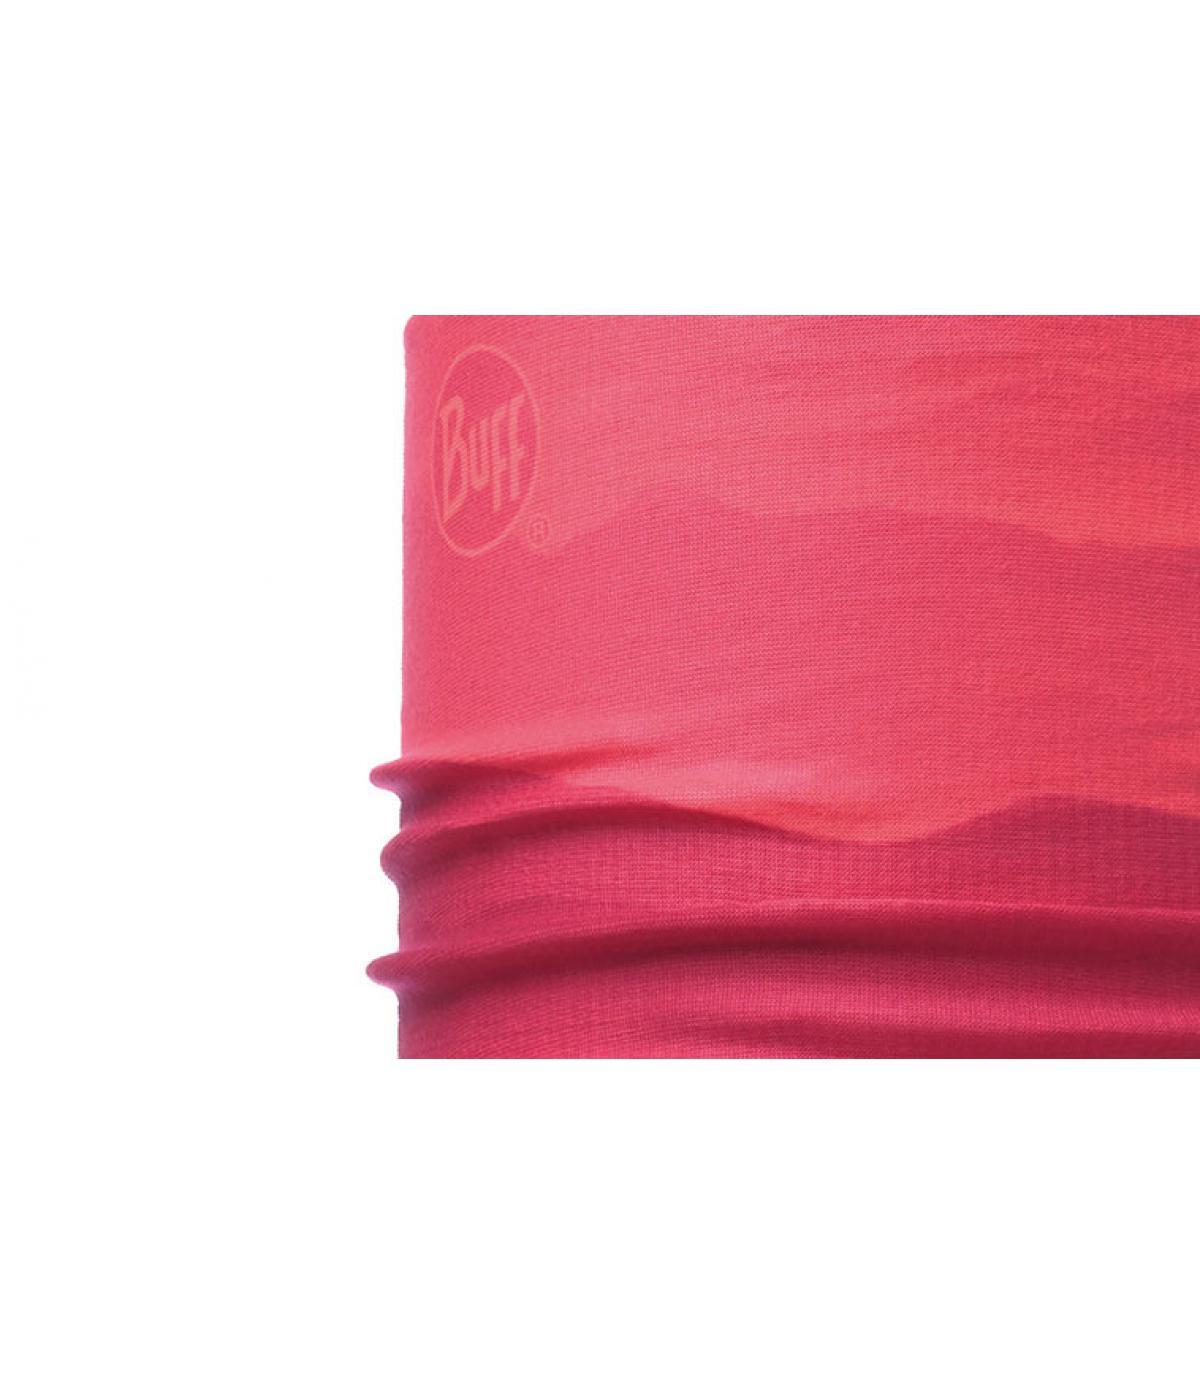 Detalles Original soft hills pink fluo imagen 2